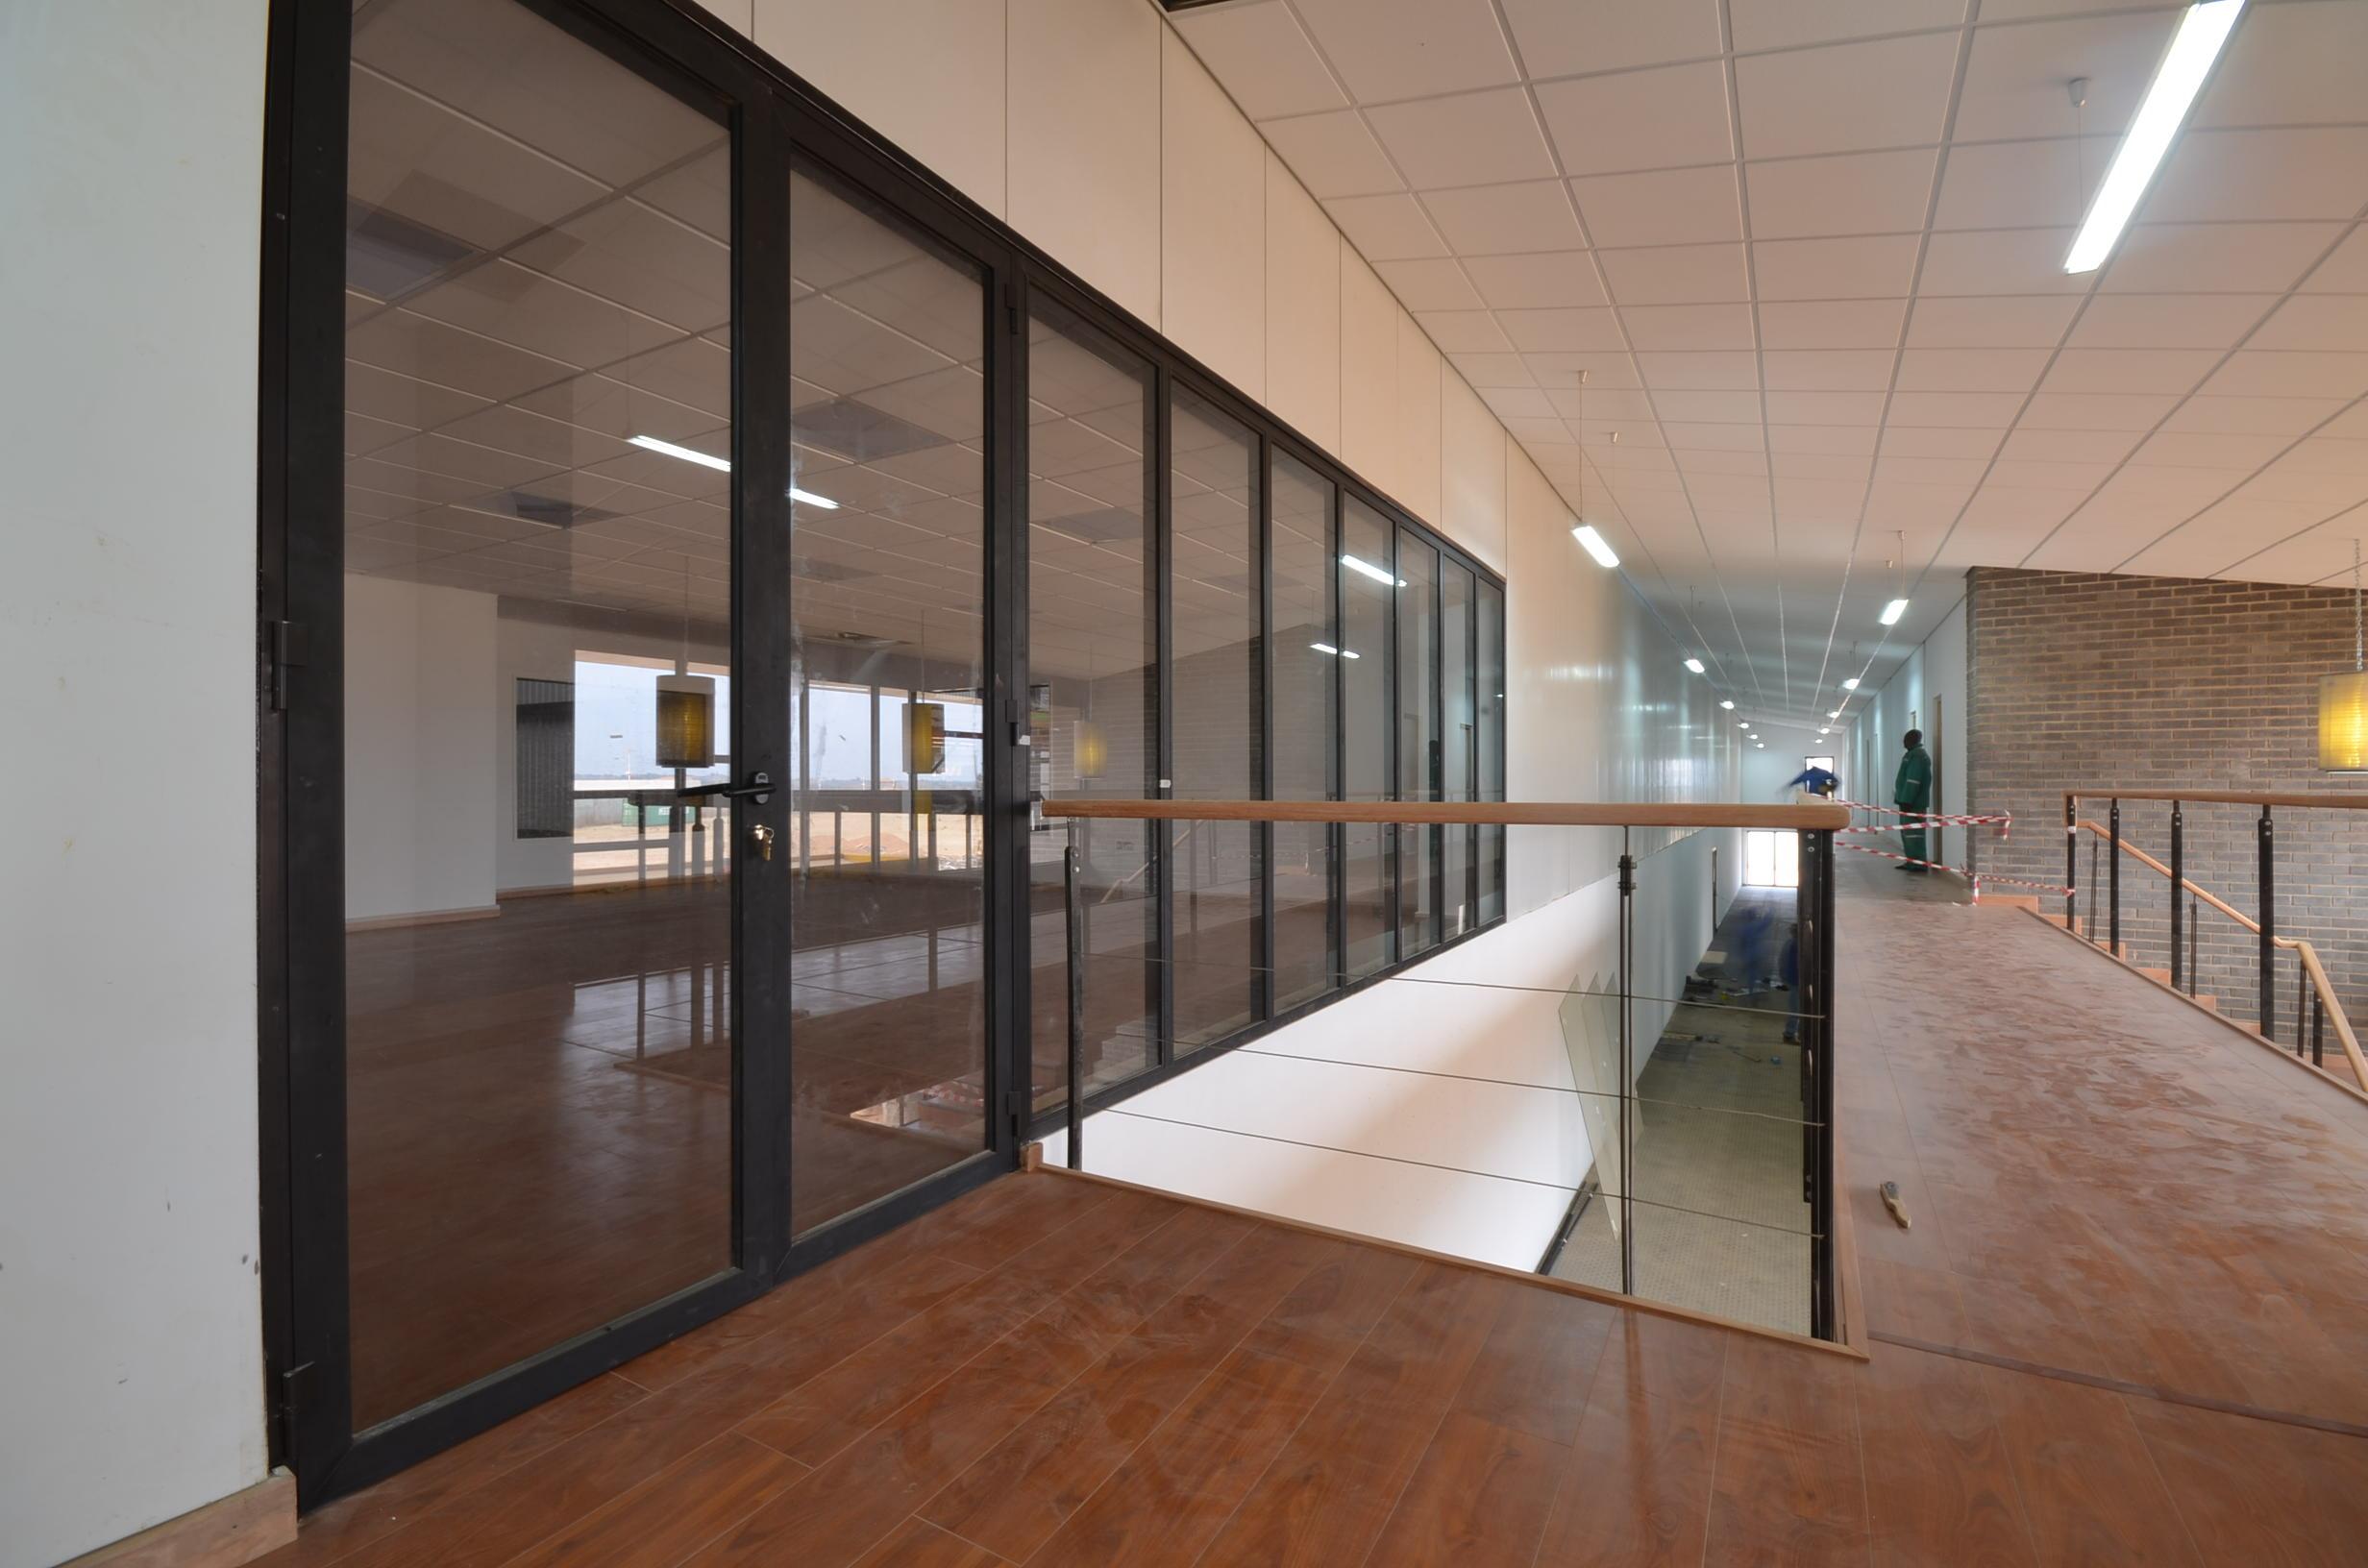 MK_MCK-Truck Depot_First floor corridor.JPG